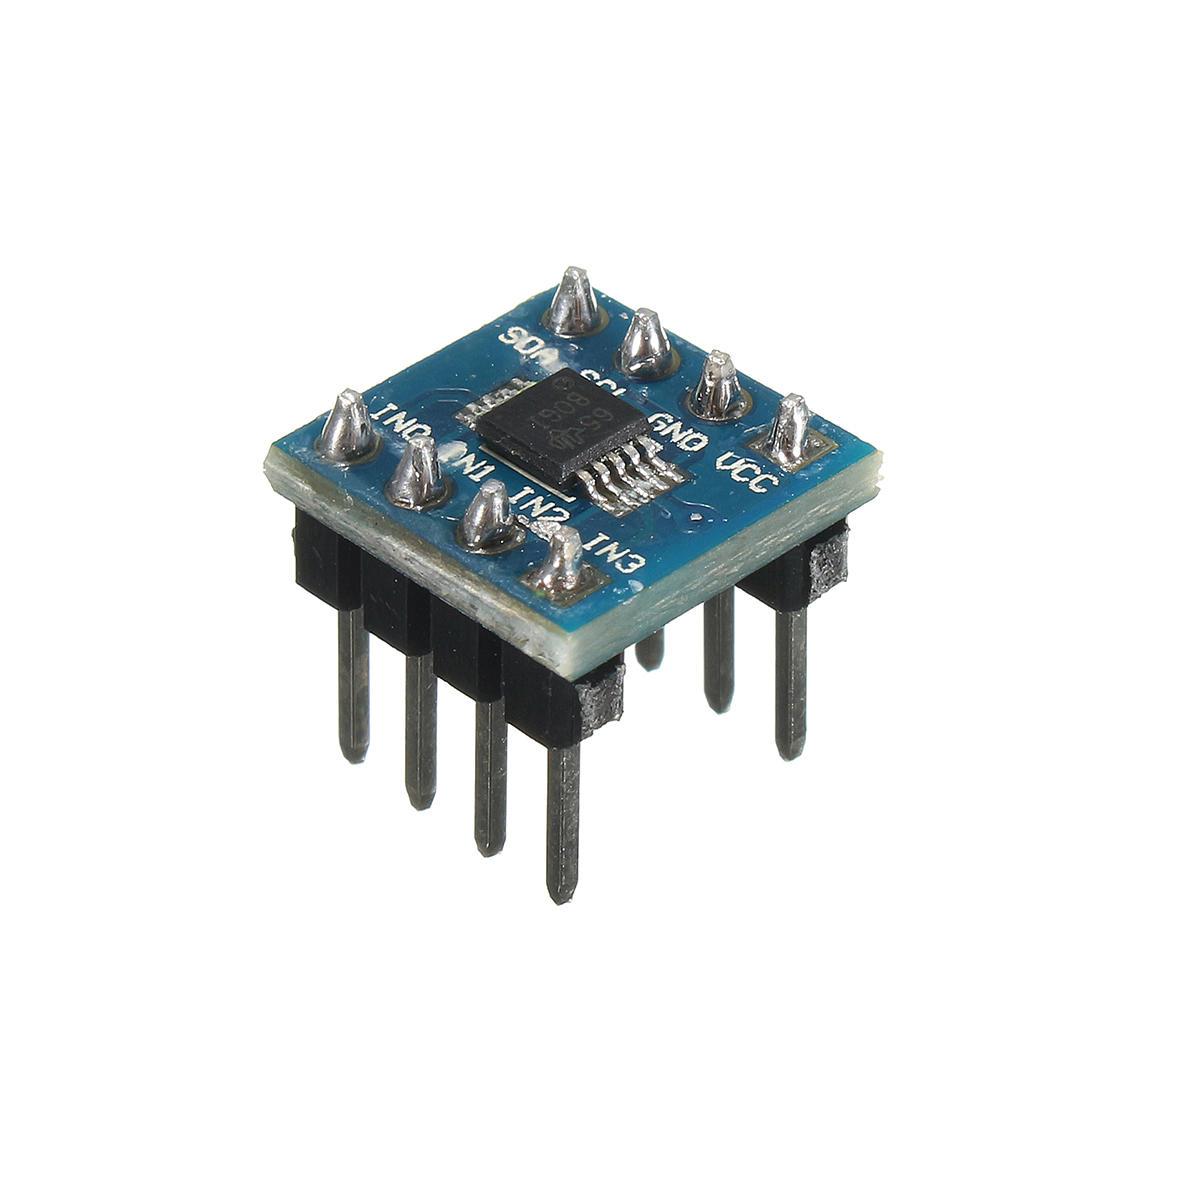 Mini ADS1115 Module 4 Channel 16 Bit I2C ADC Pro Gain Amplifier For Arduino